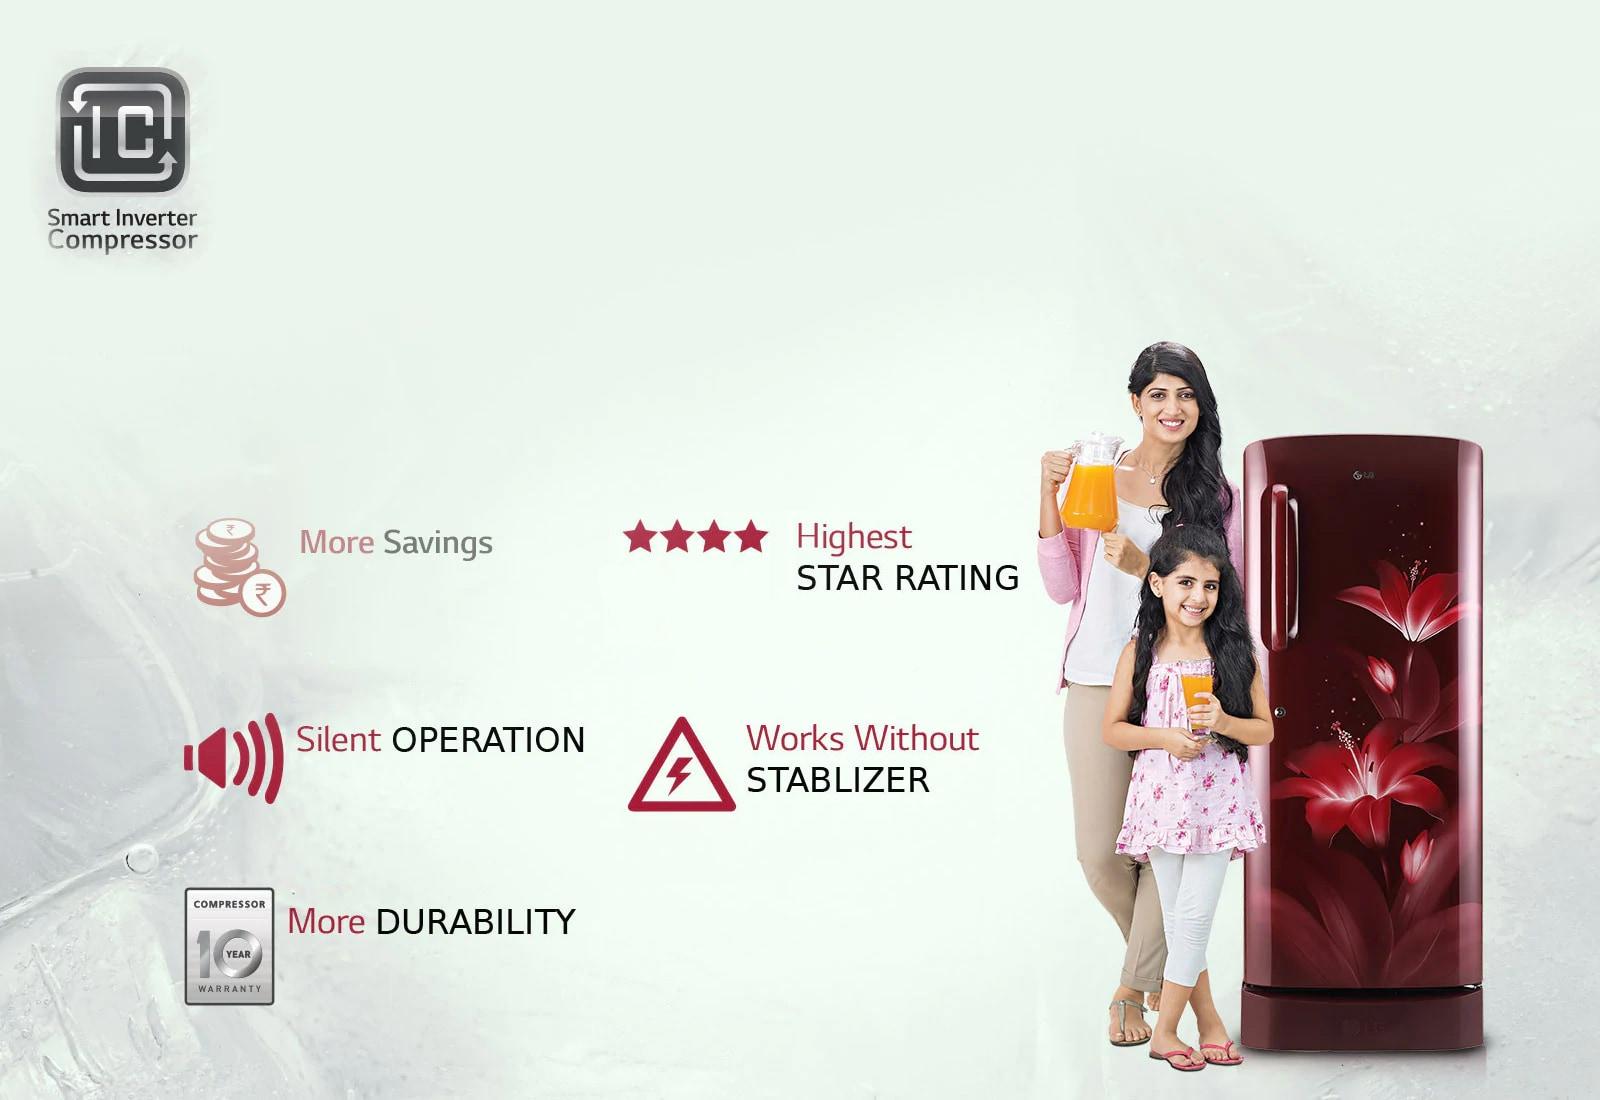 LG Smart Inverter Compressor Refrigerator